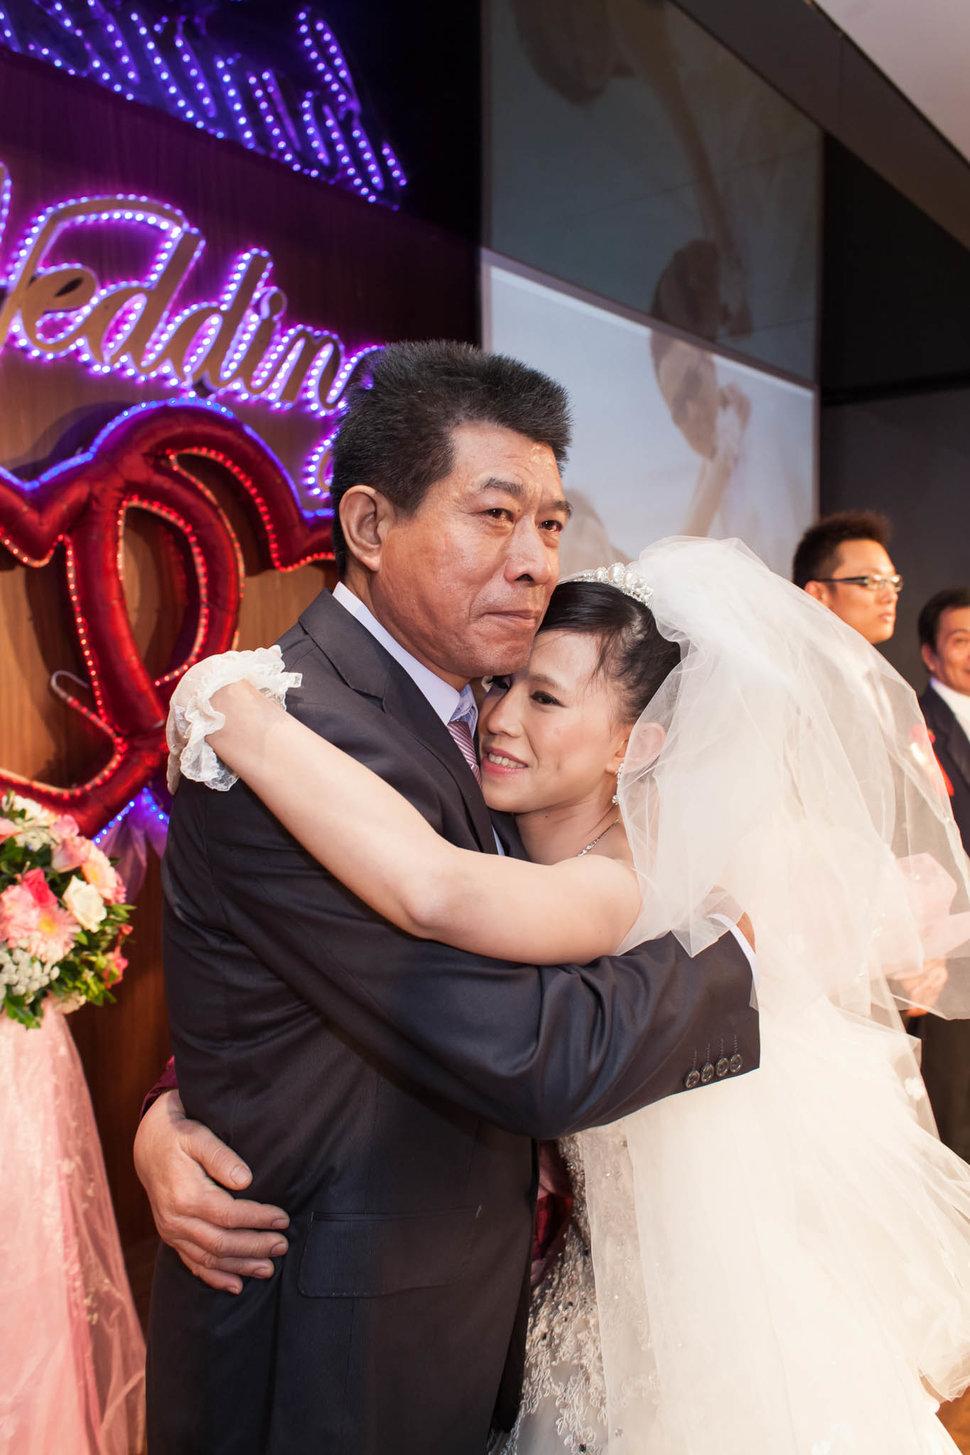 18PHOTO-青蛙王子娶新娘❤️(編號:218646) - 18PHOTO 婚紗影像攝影工作室 - 結婚吧